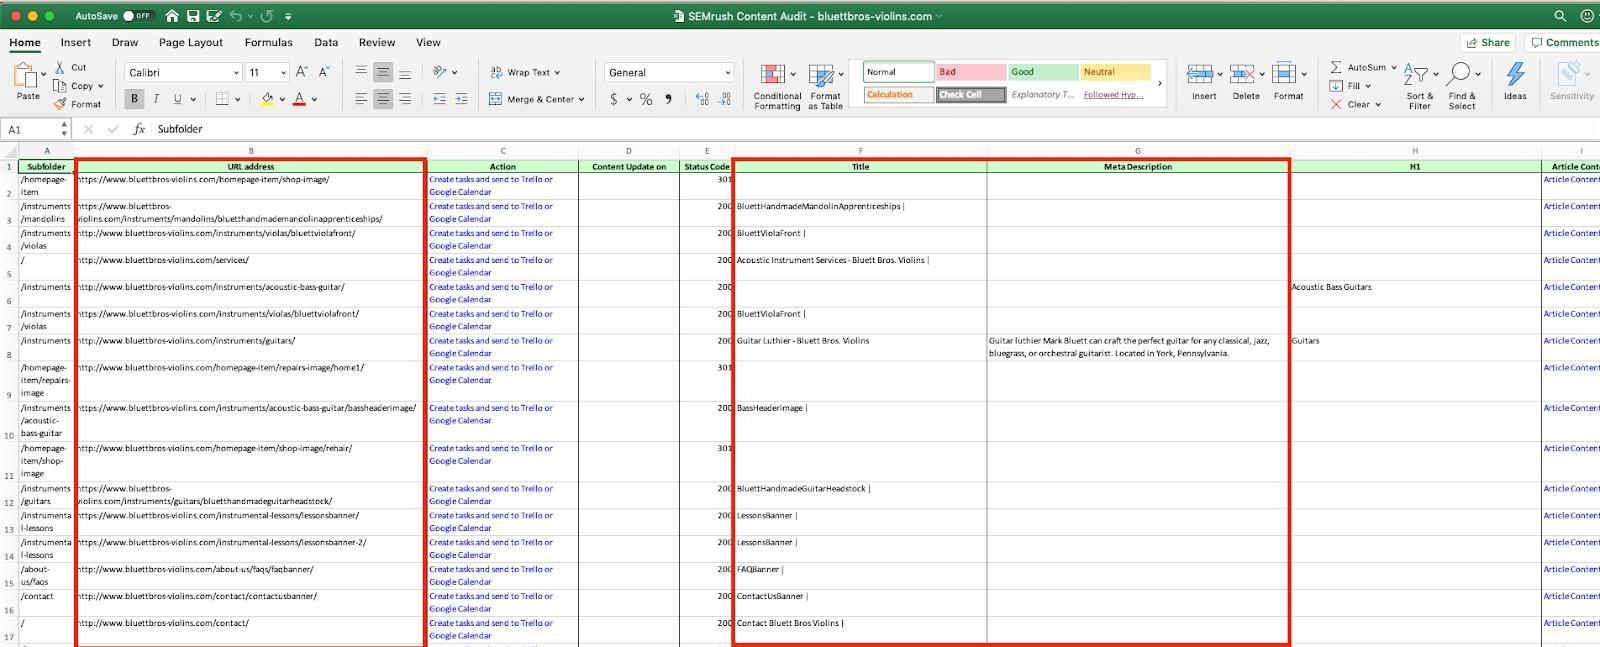 Optimizing Page Title and Meta Description via Semrush image 3